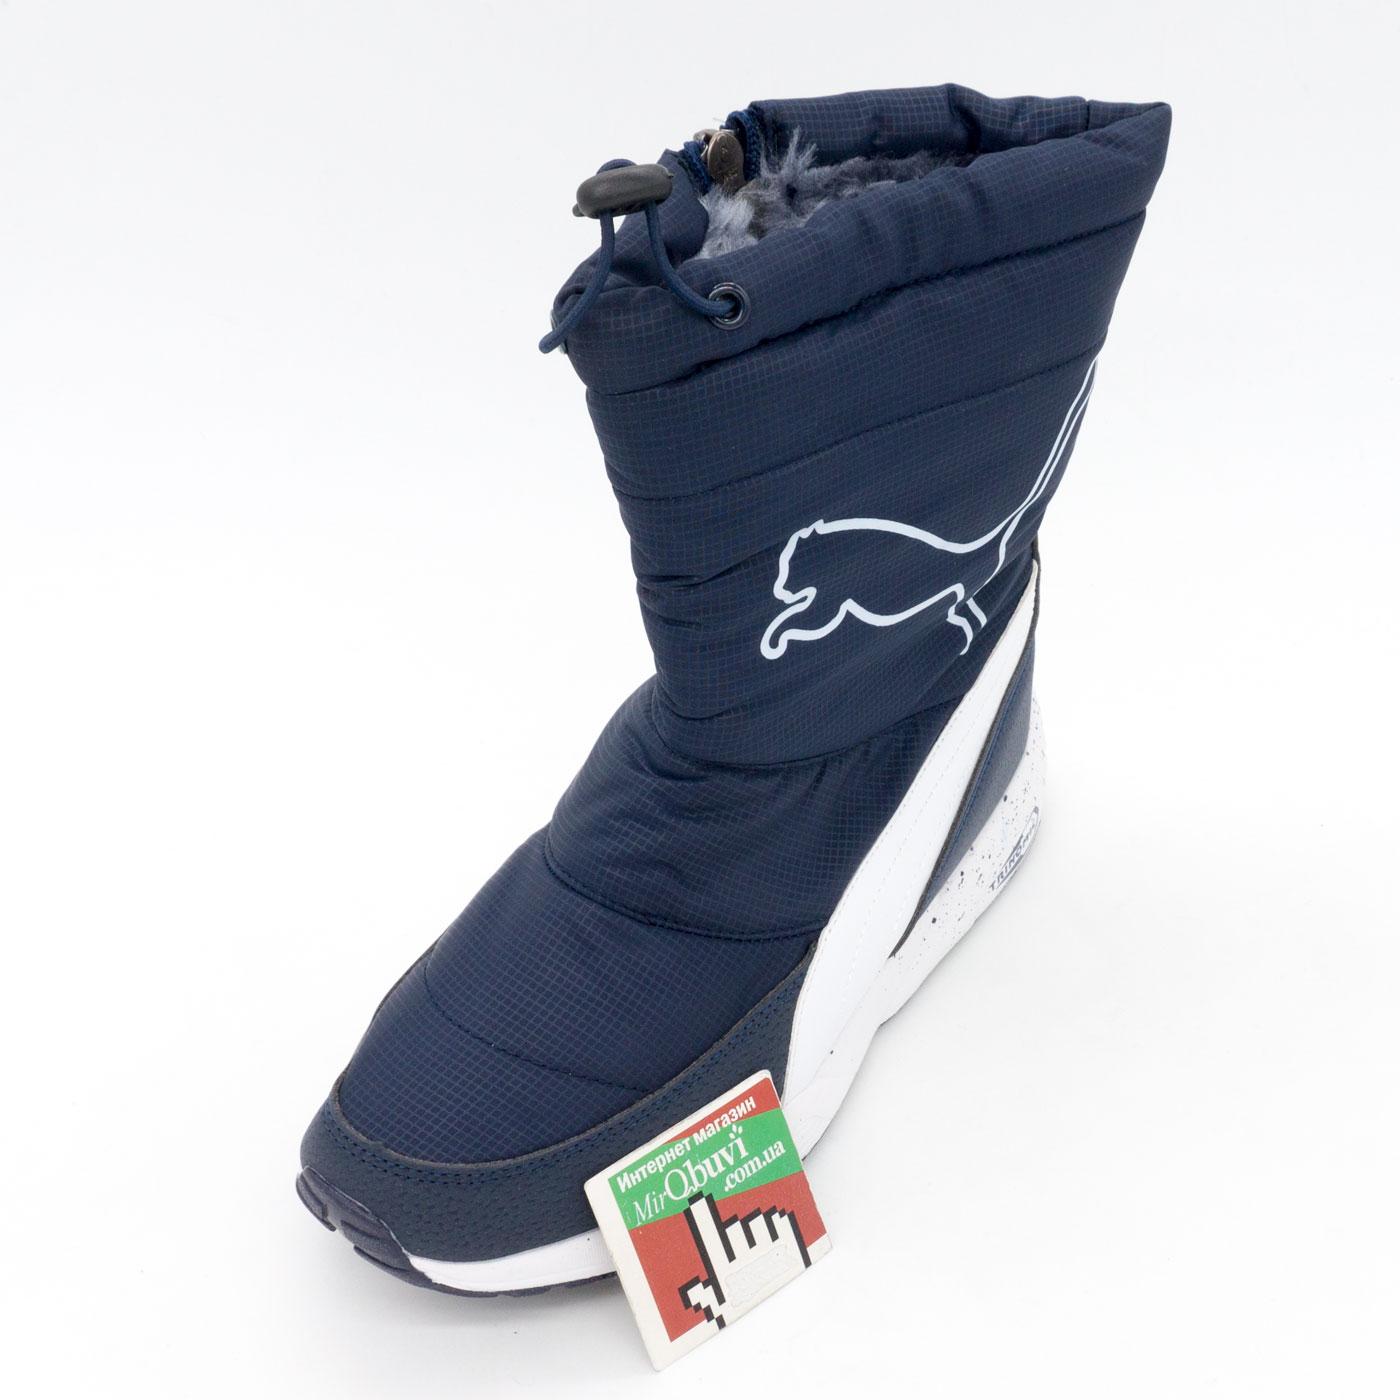 фото front Зимние женские синие дутики с мехом Puma front